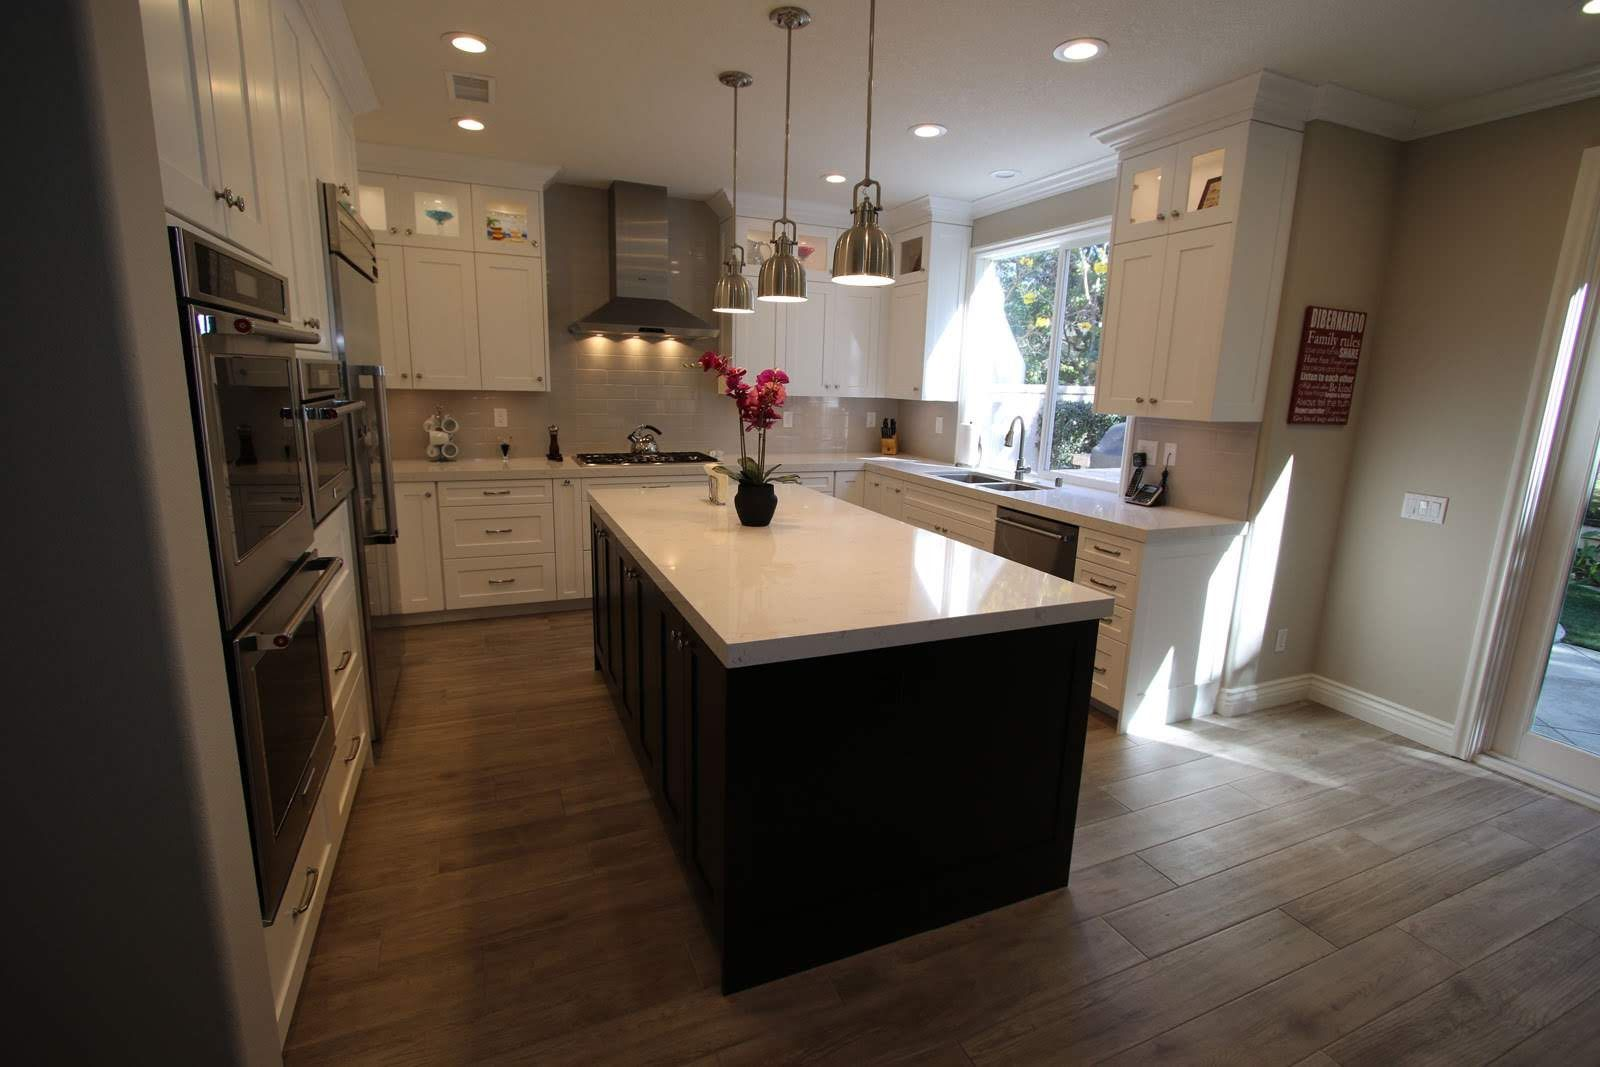 Huntington Beach Transitional Design Build Kitchen Remodel Kitchen Remodel Transitional Design Building Design